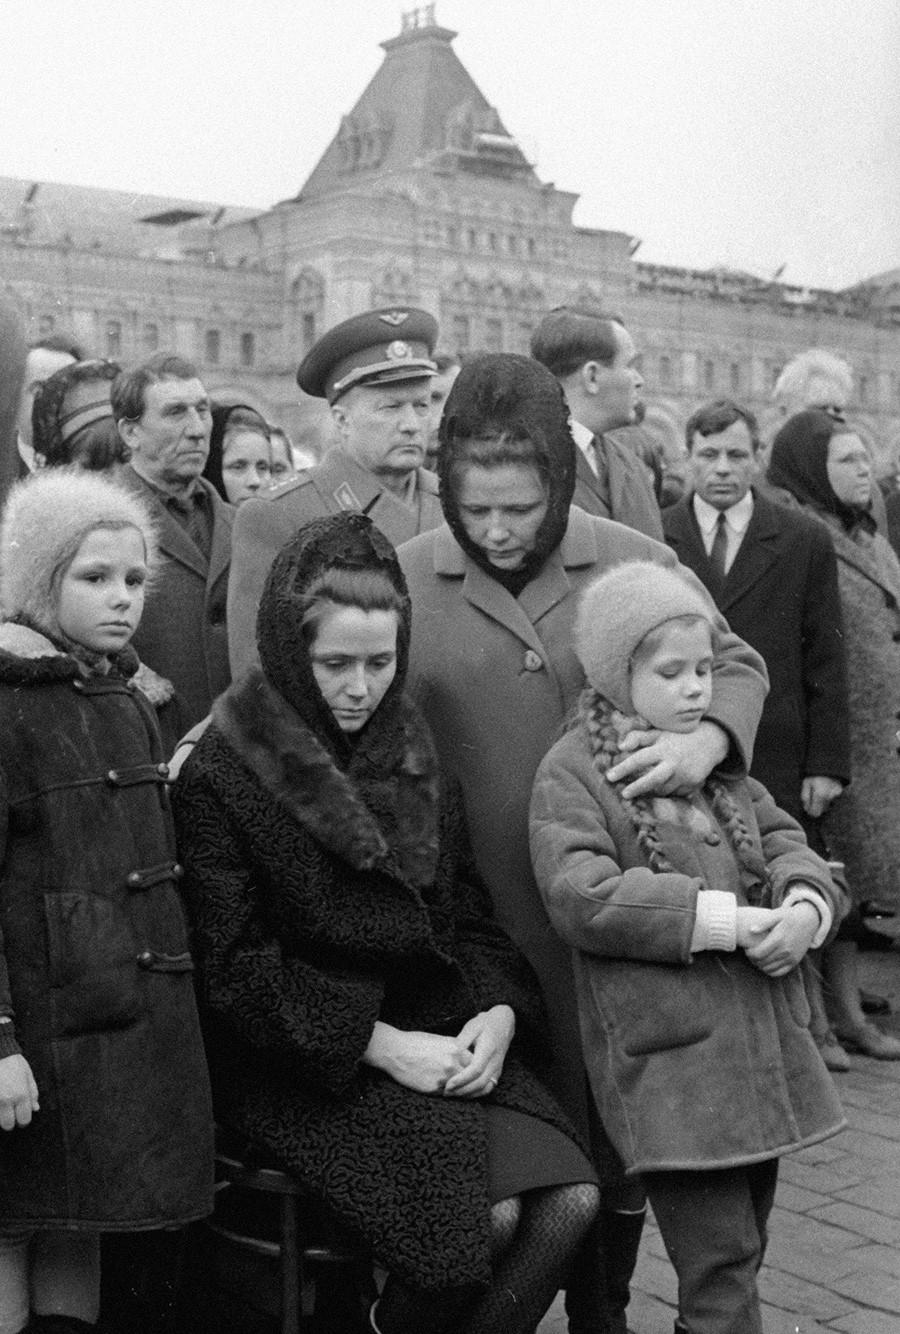 Валентина са ћеркама на сахрани Јурија Гагарина и Владимира Серјогина на Црвеном тргу.